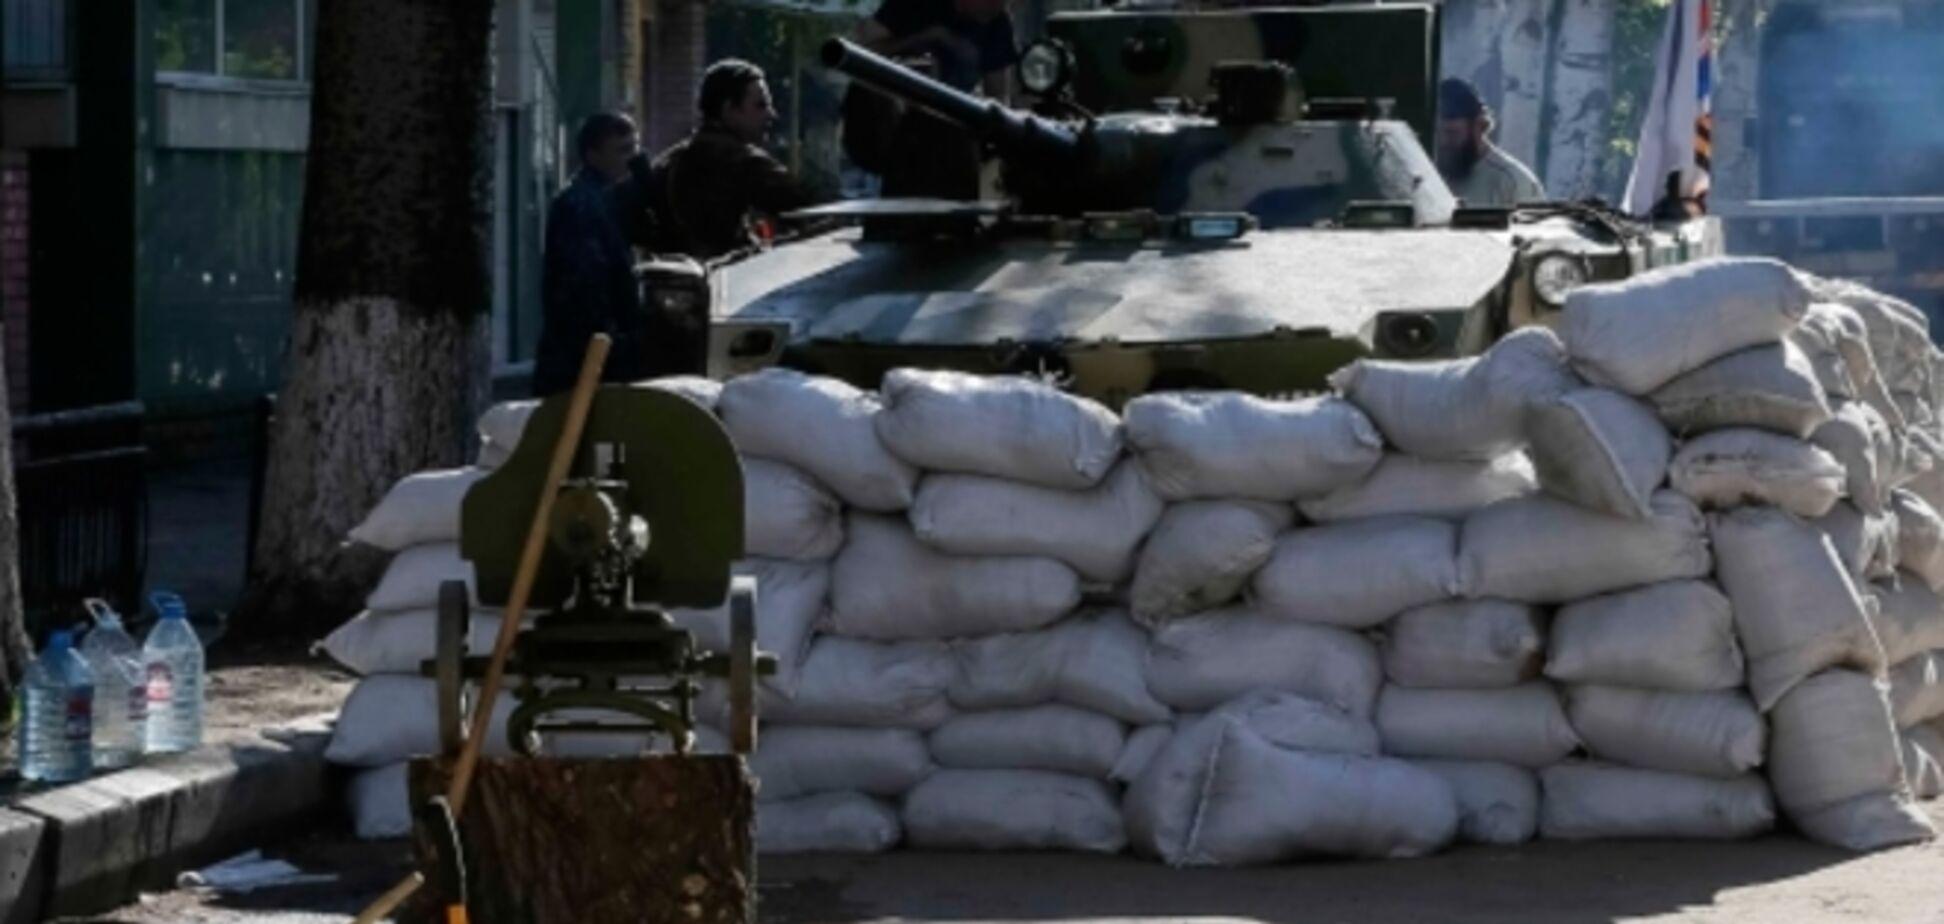 Силовики разблокировали два блокпоста сепаратистов в районе Славянска